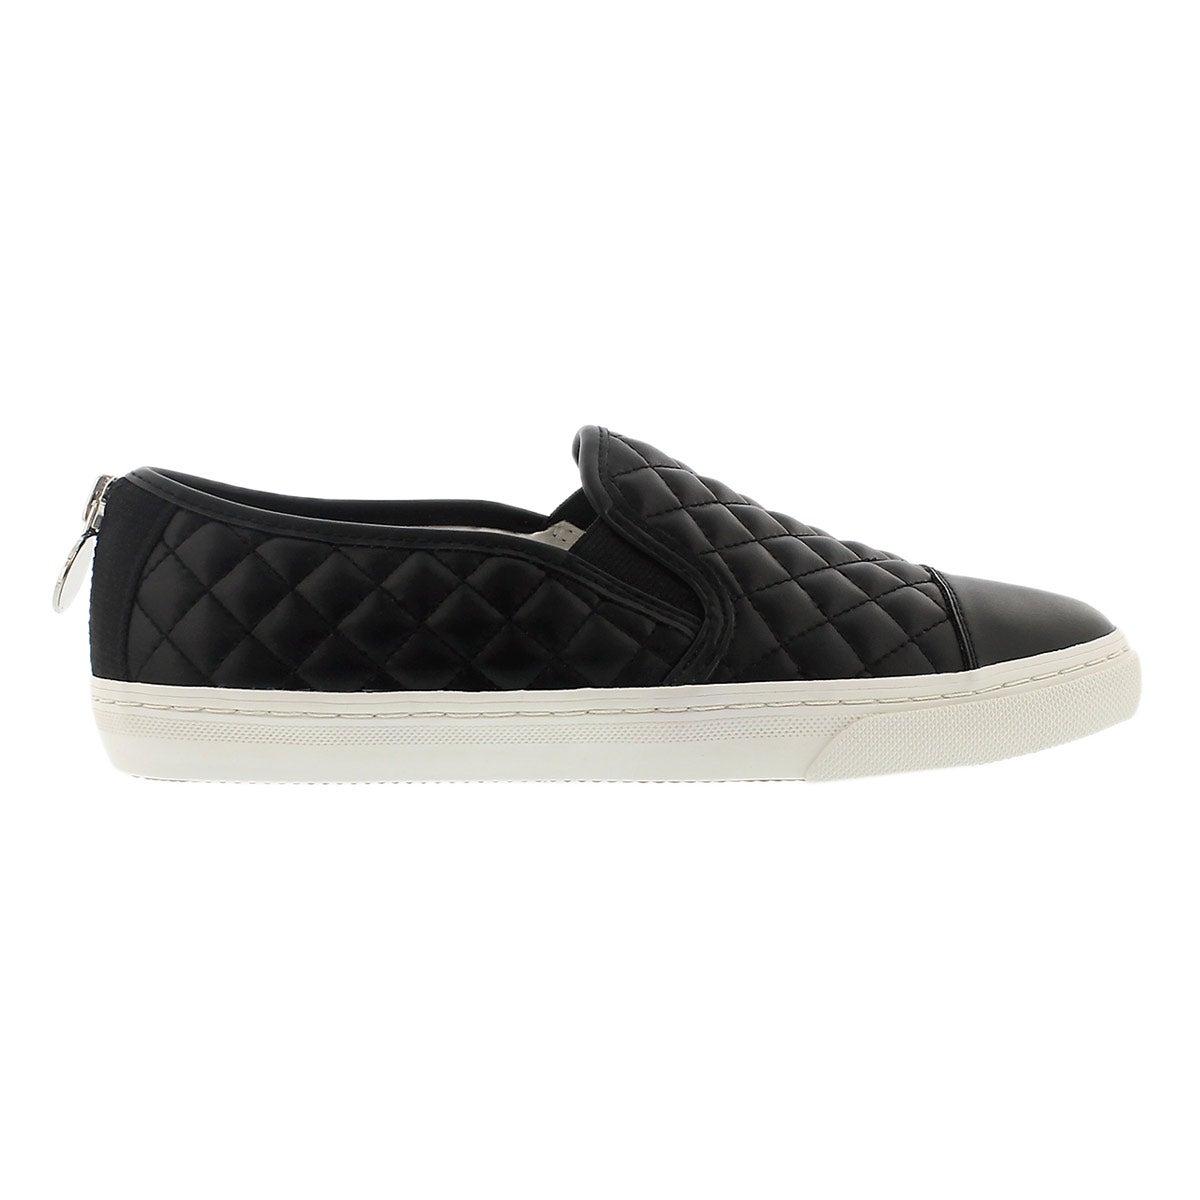 Lds New Club black slip on sneaker